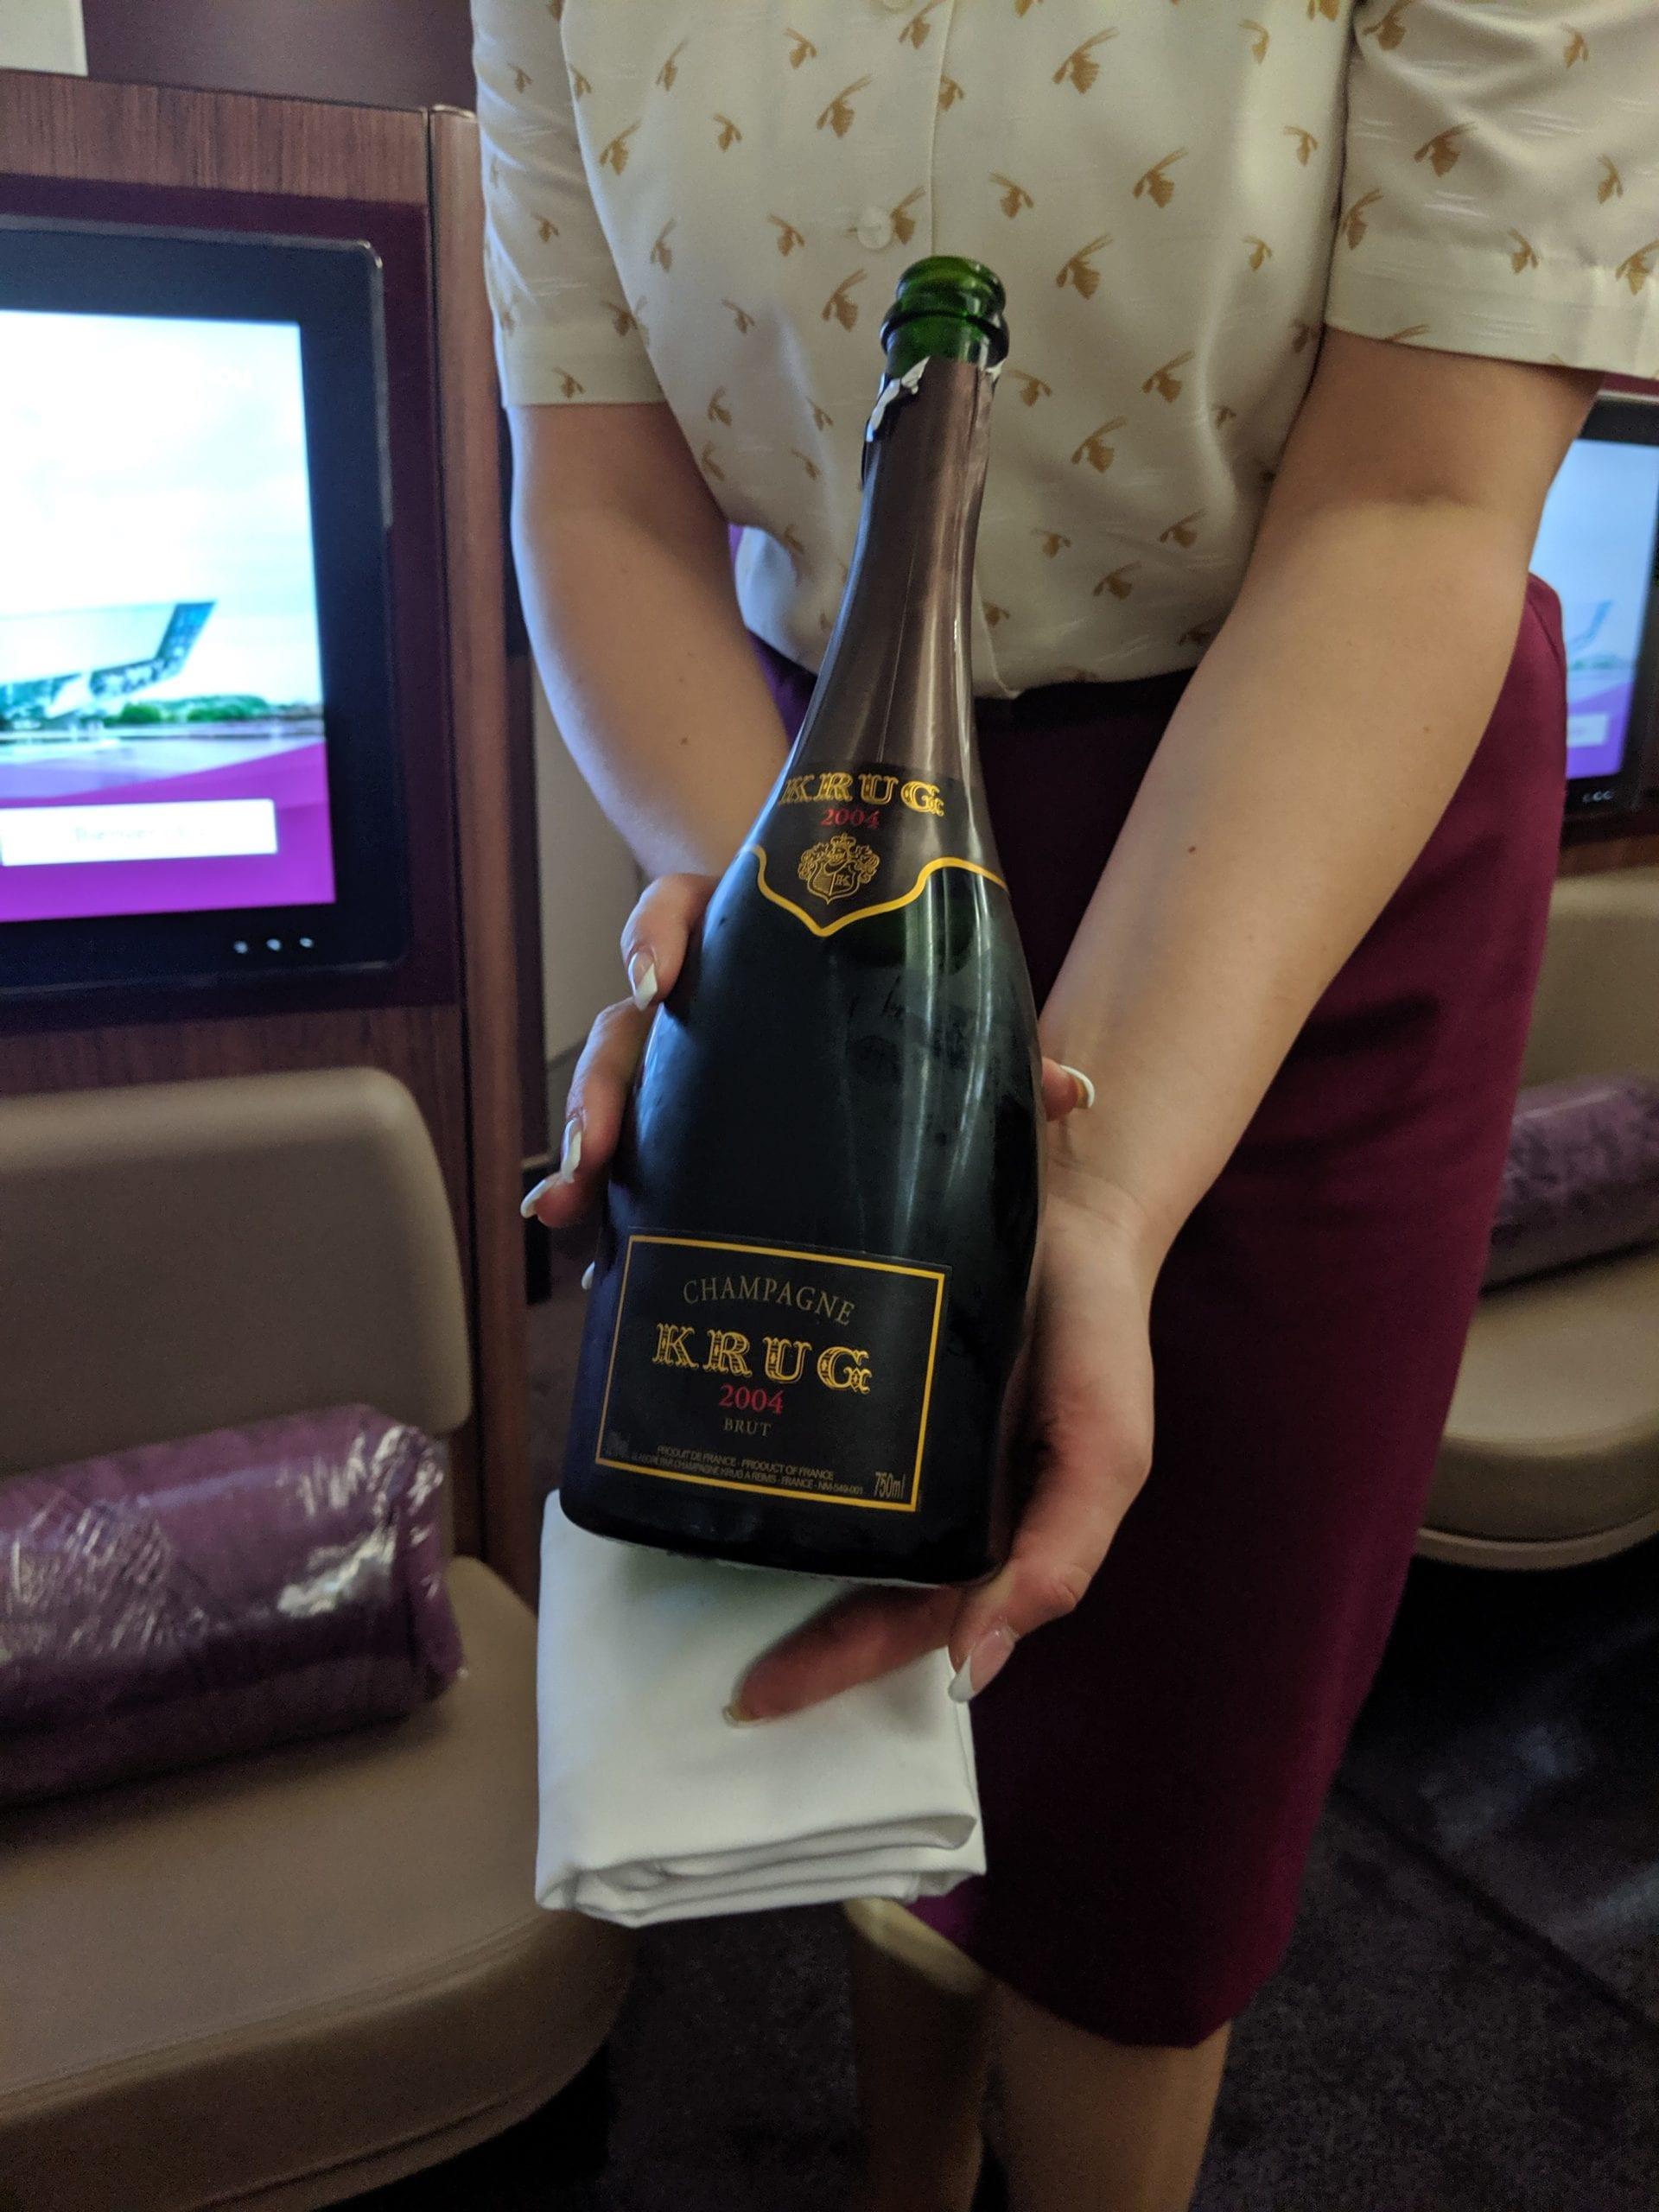 qatar airways first class champagne